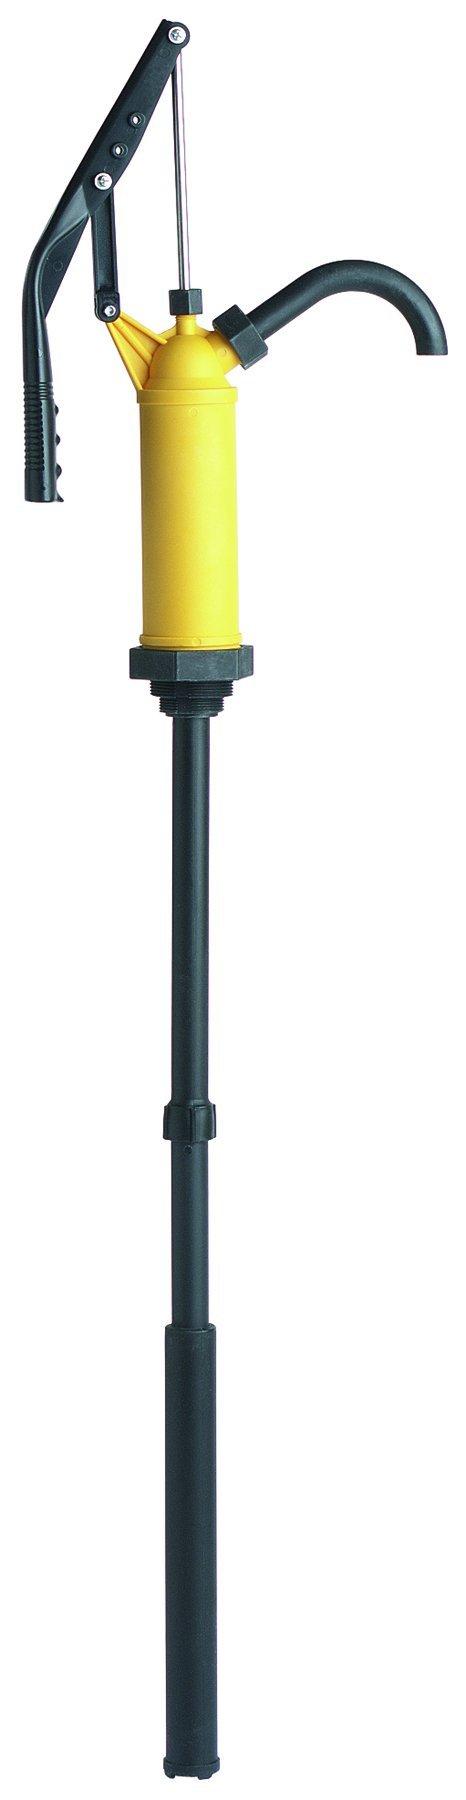 Plews 55-161 Plastic Standard Duty Lever Pump